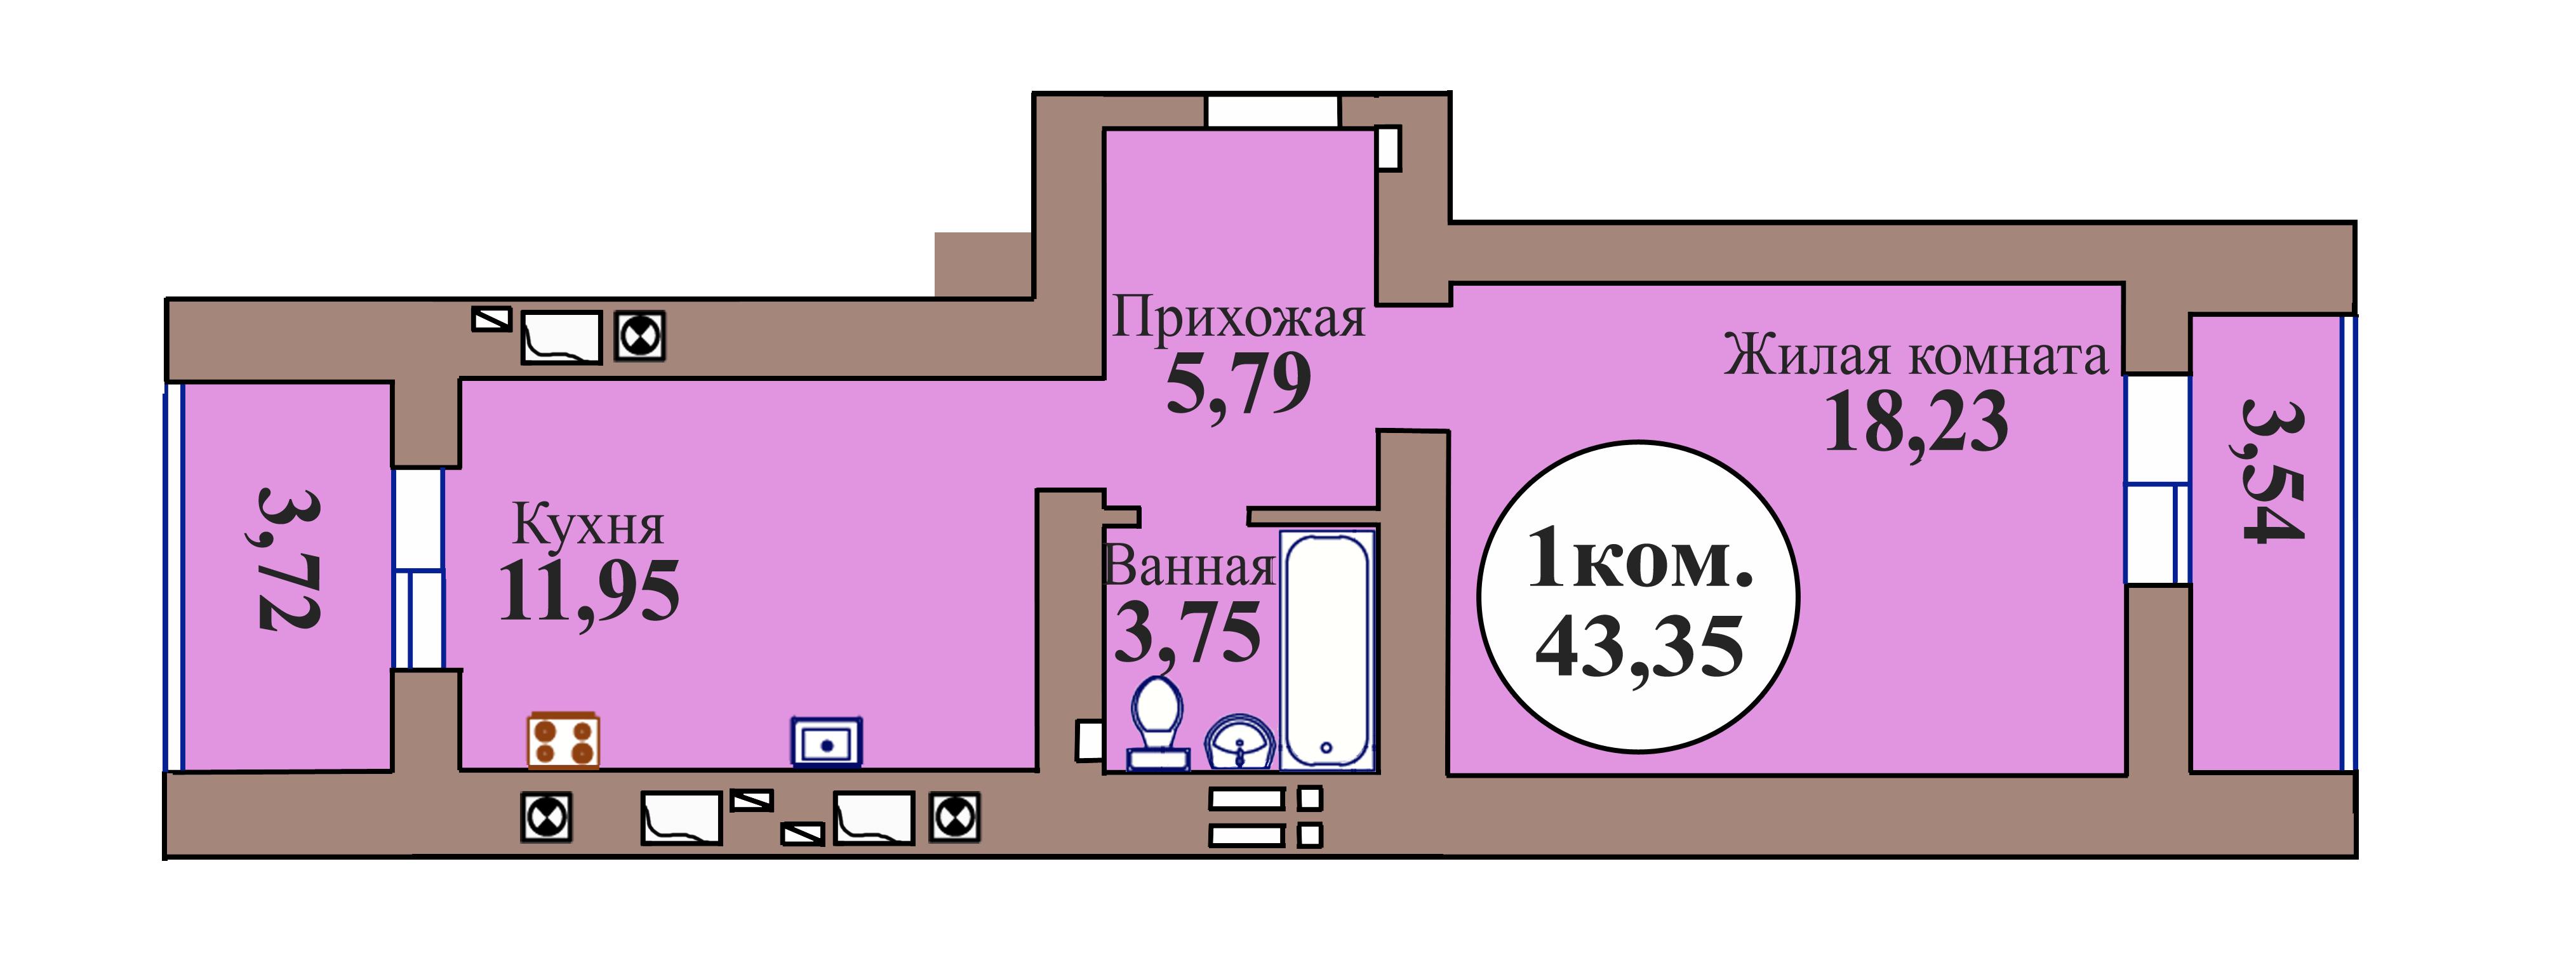 1-комн. кв. по ГП дом №3, МКР Васильково, кв. 90 в Калининграде